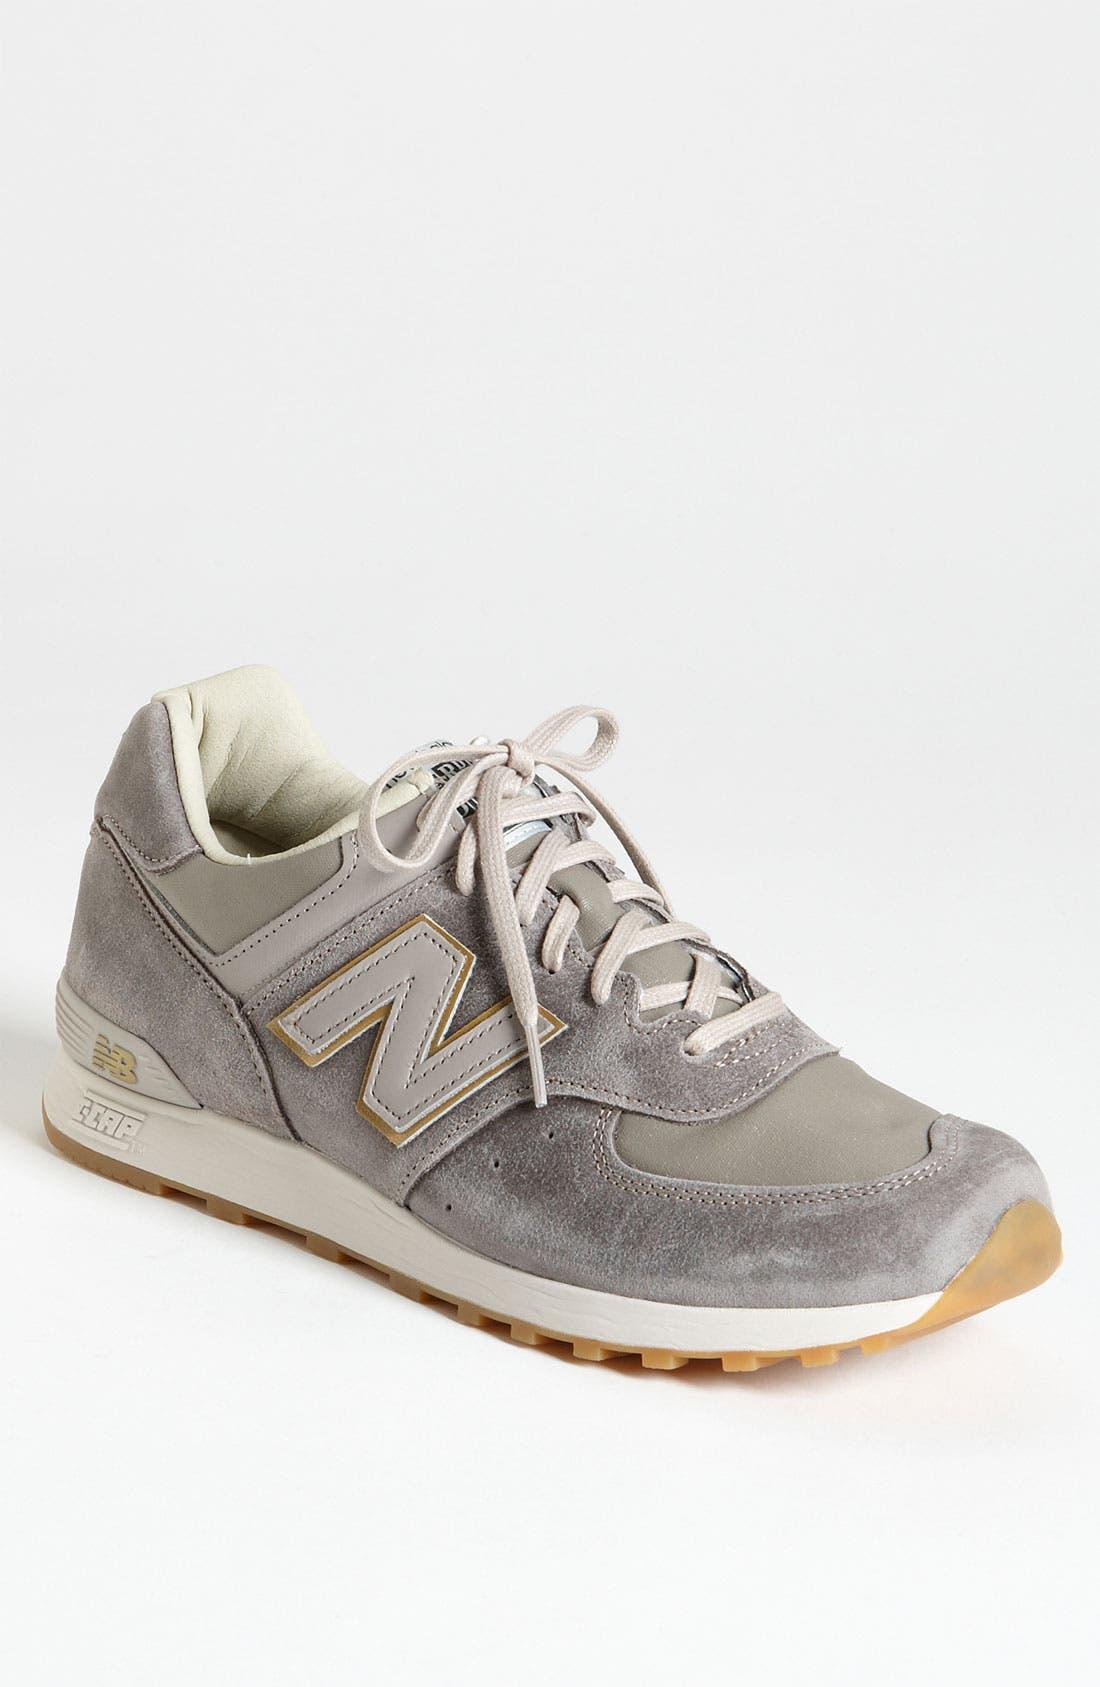 Alternate Image 1 Selected - New Balance '576 Flimby UK' Sneaker (Men)